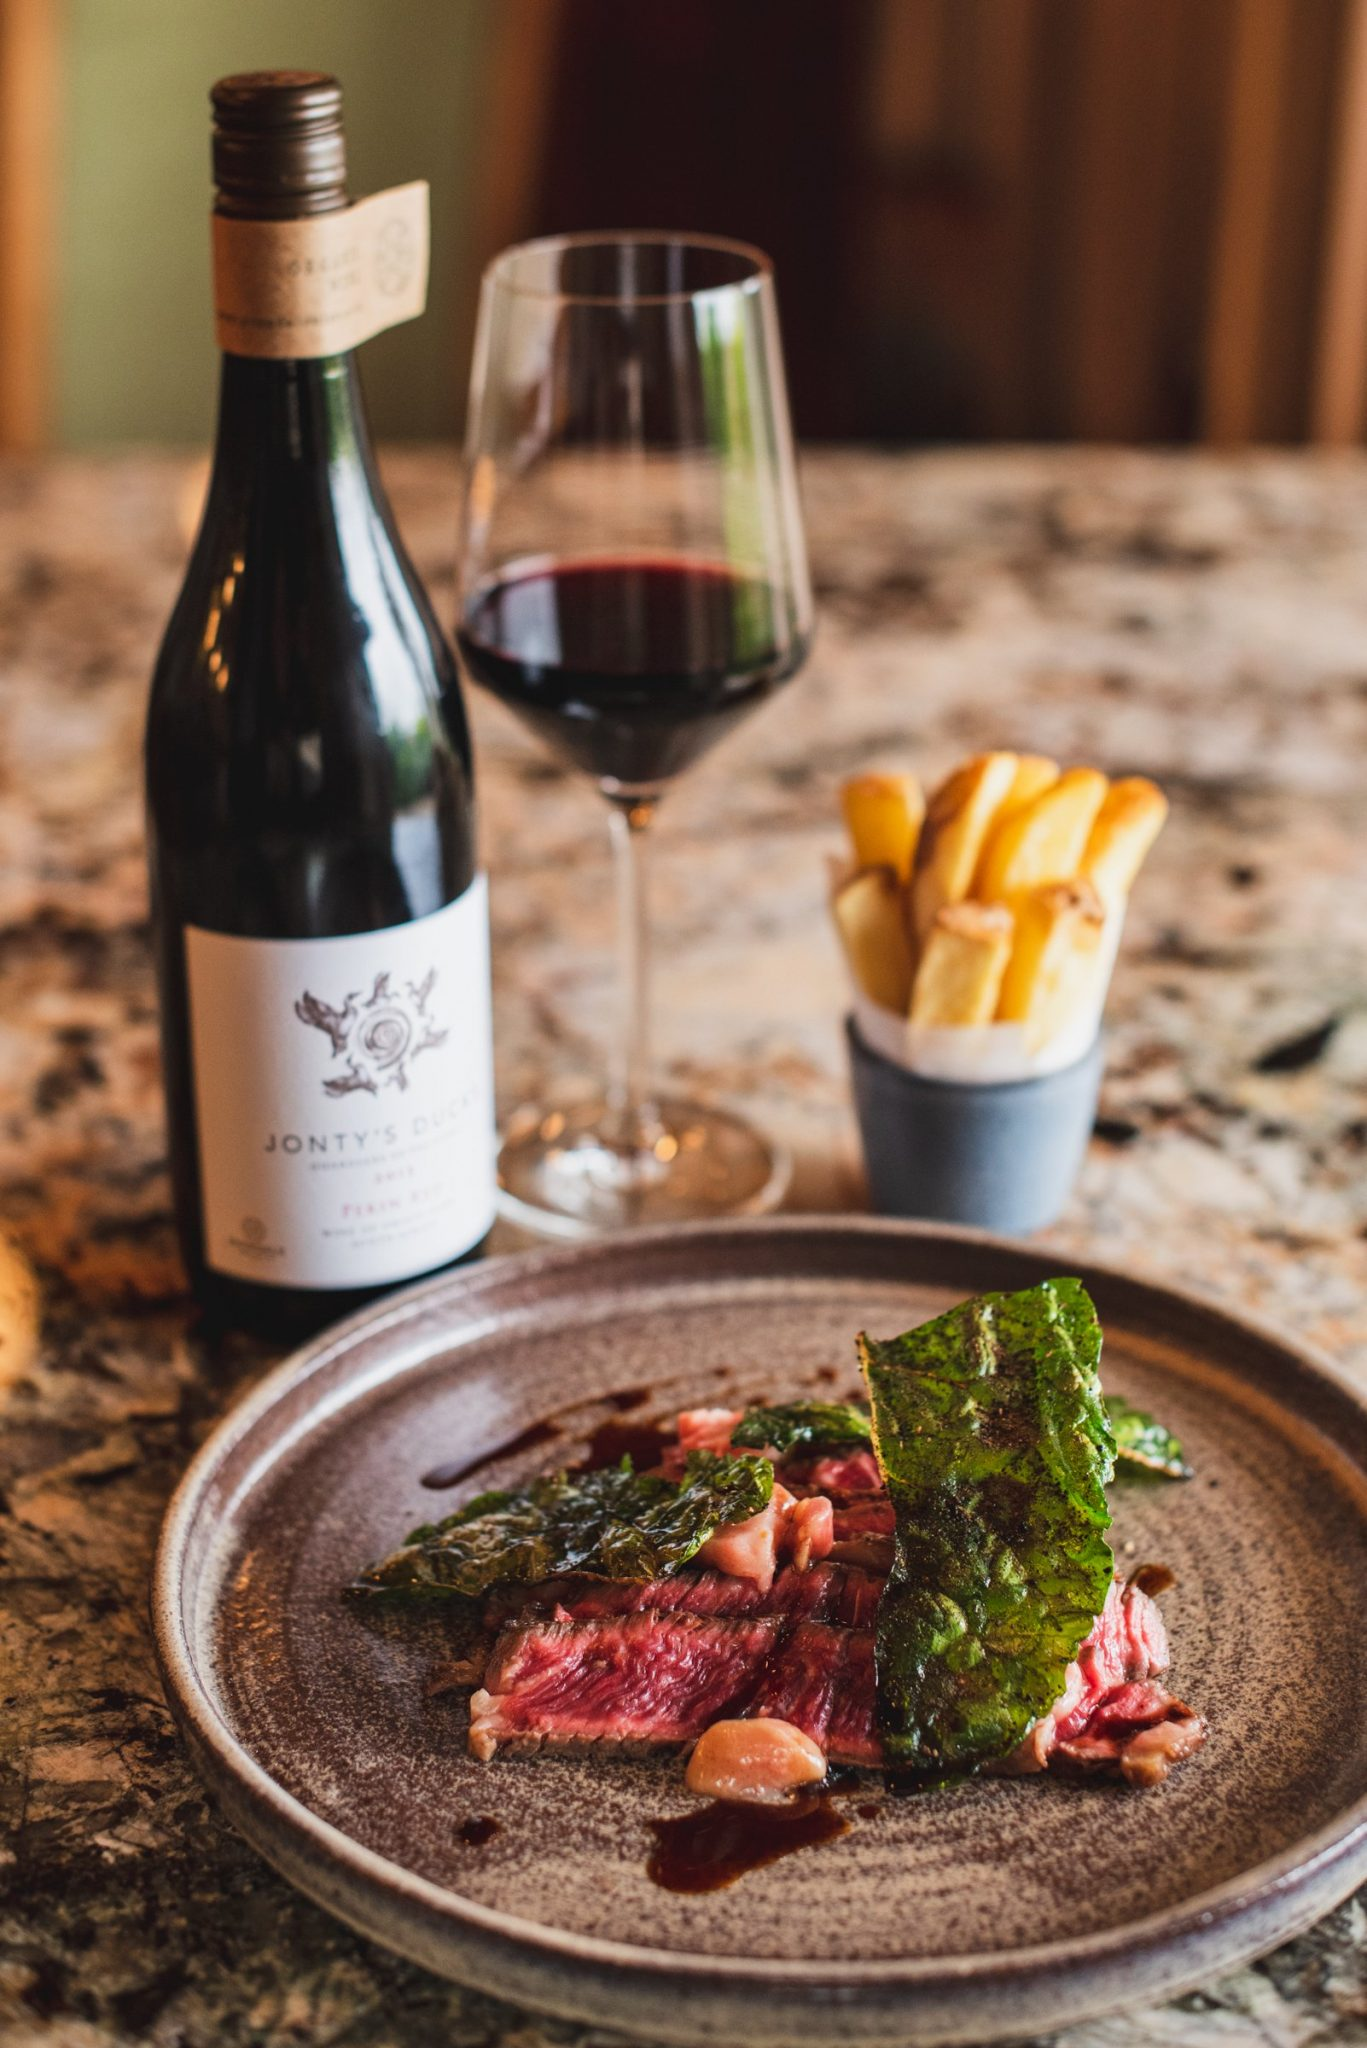 steak chips red wine avondale faberfood sonia cabano bvlog eatdrinkcapetown